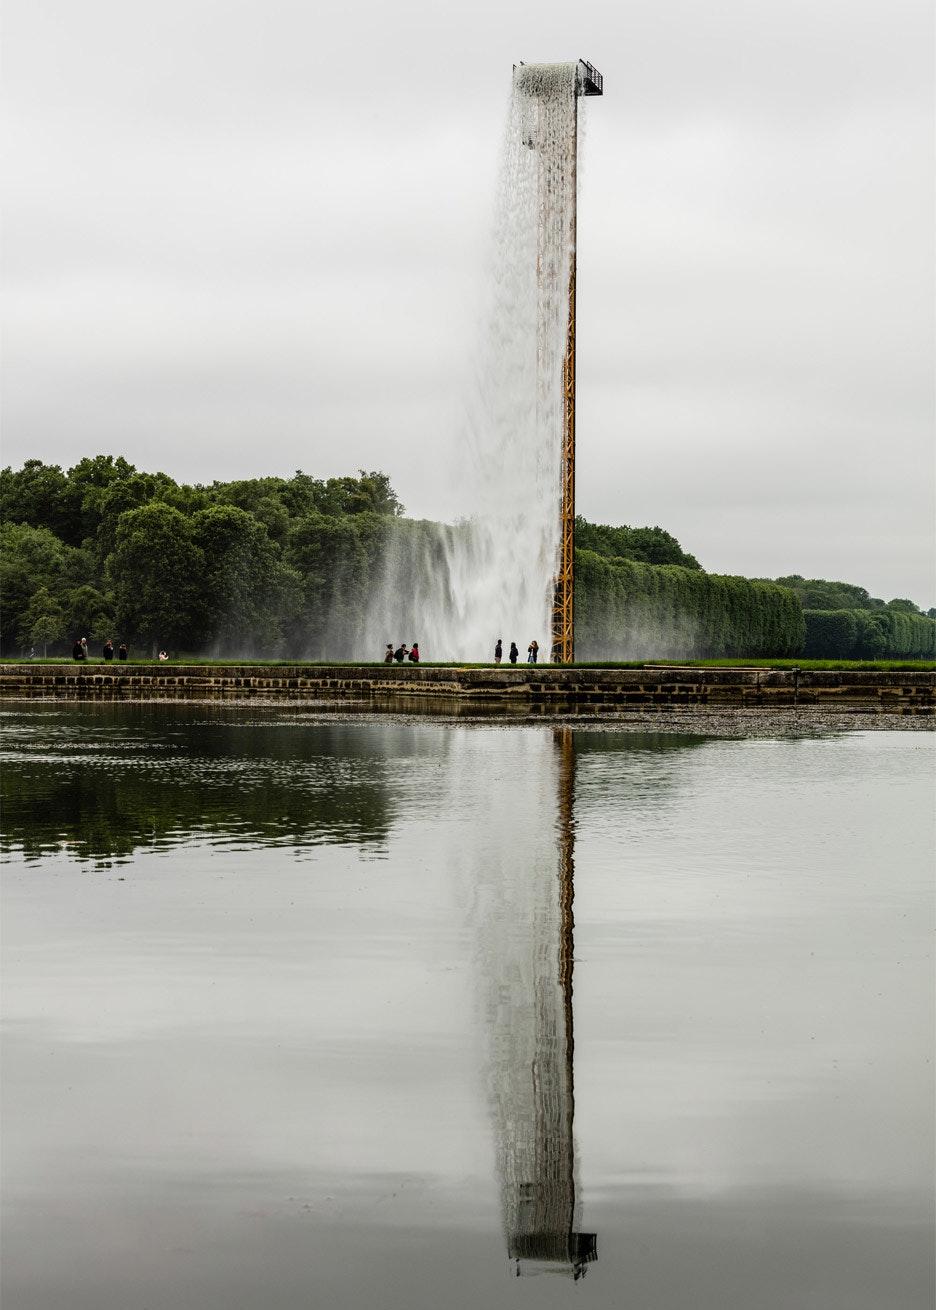 waterfall-olafur-eliasson-versailles-installation-art-france-anders-sune-berg_dezeen_936_3